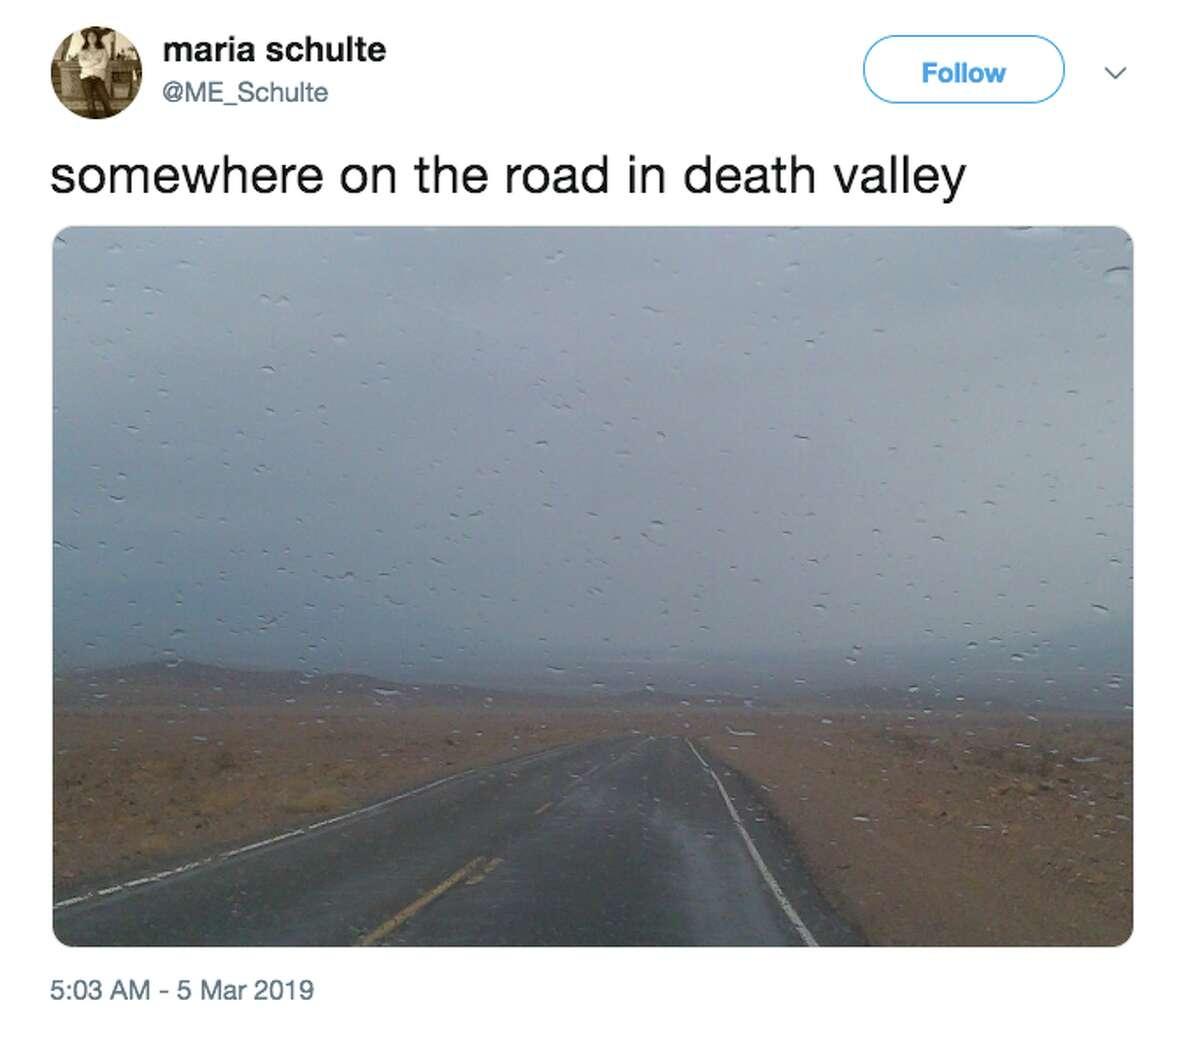 Death Valley National Park saw unusually heavy rain March 5-6, 2019.